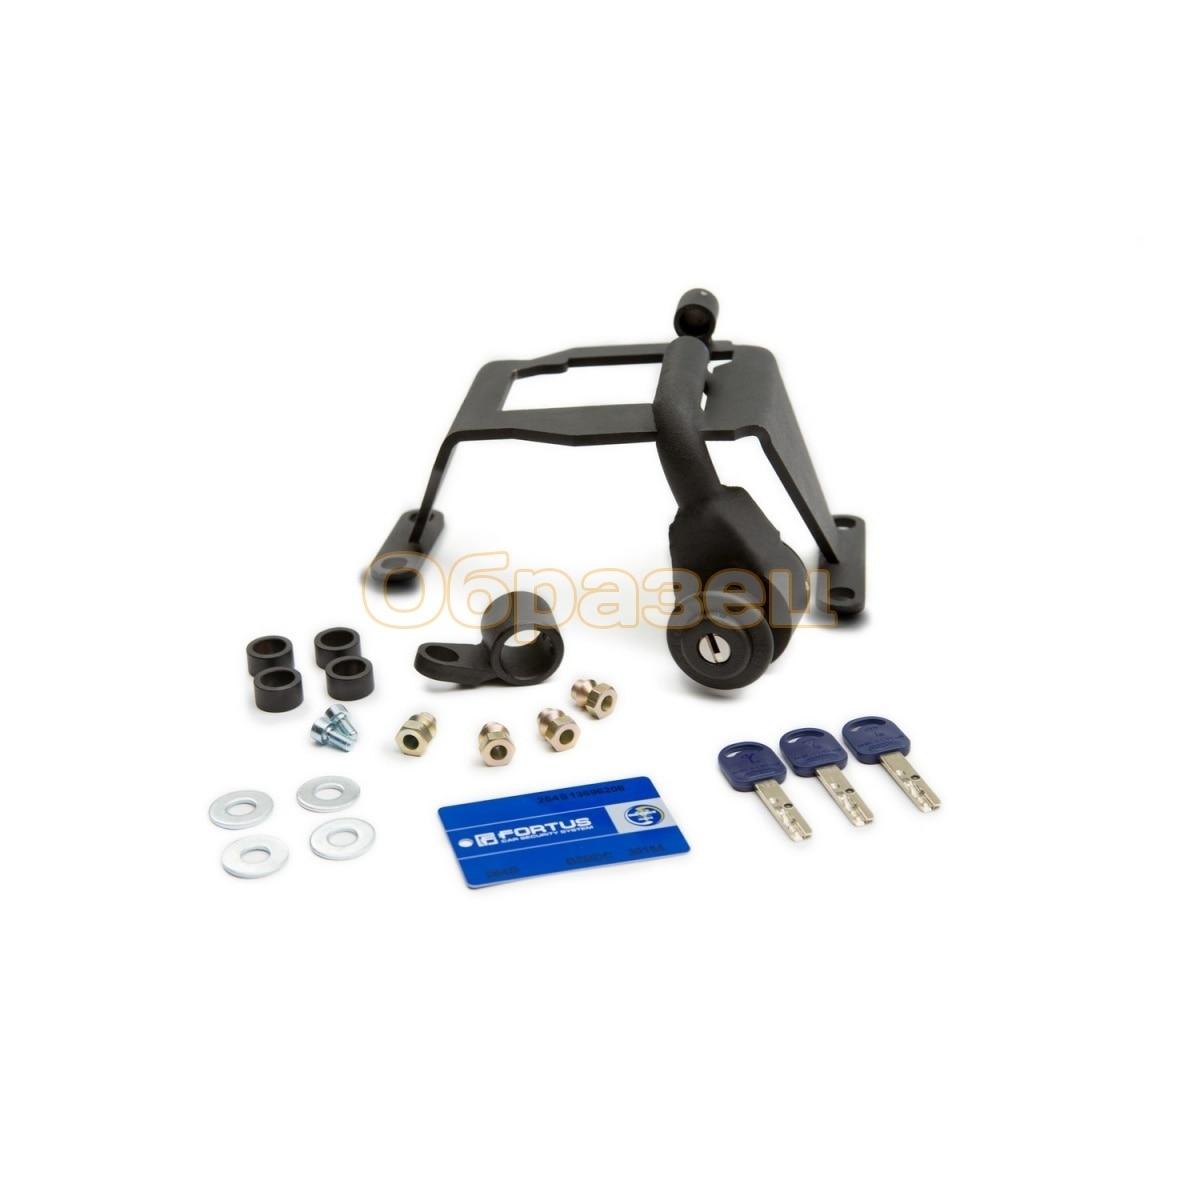 Gearbox lock (MTL) 2593 INT for Arkana 2019  5MT (Renault) Car Steering Wheel Lock     - title=